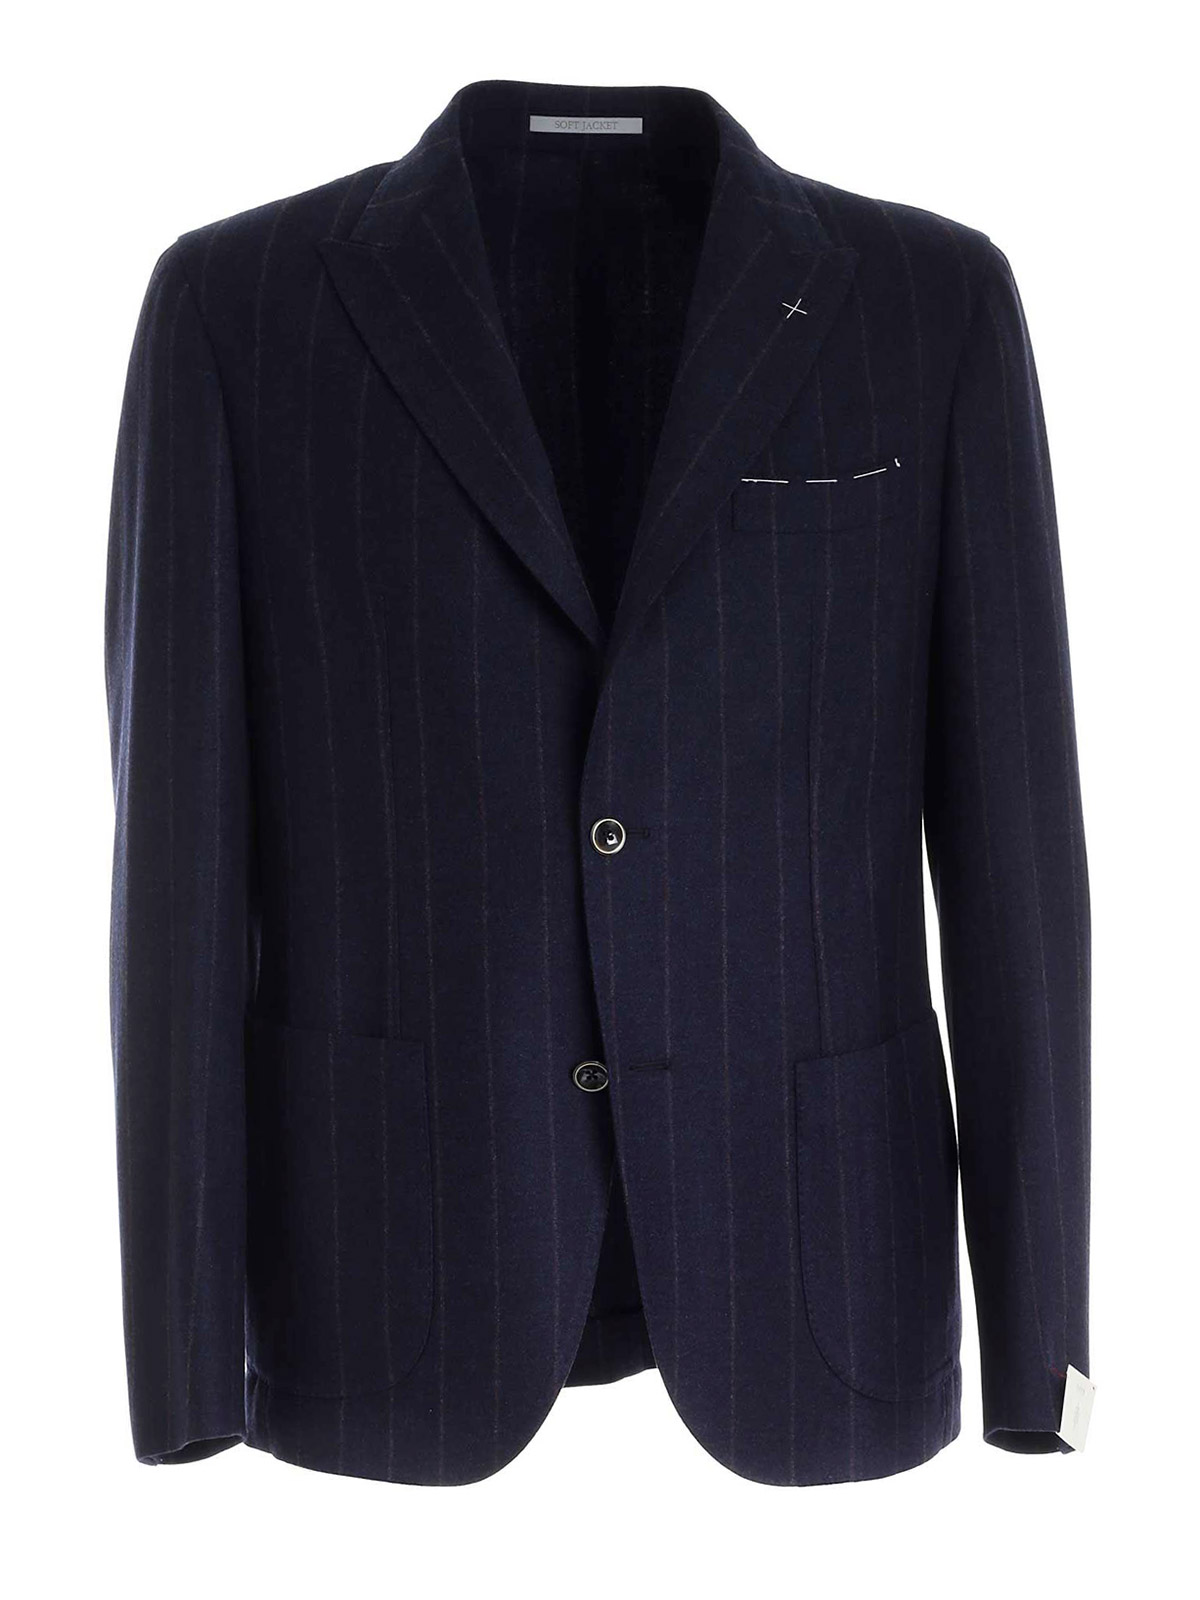 Picture of ELEVENTY | Men's Pinstripe Wool and Cashmere Blazer